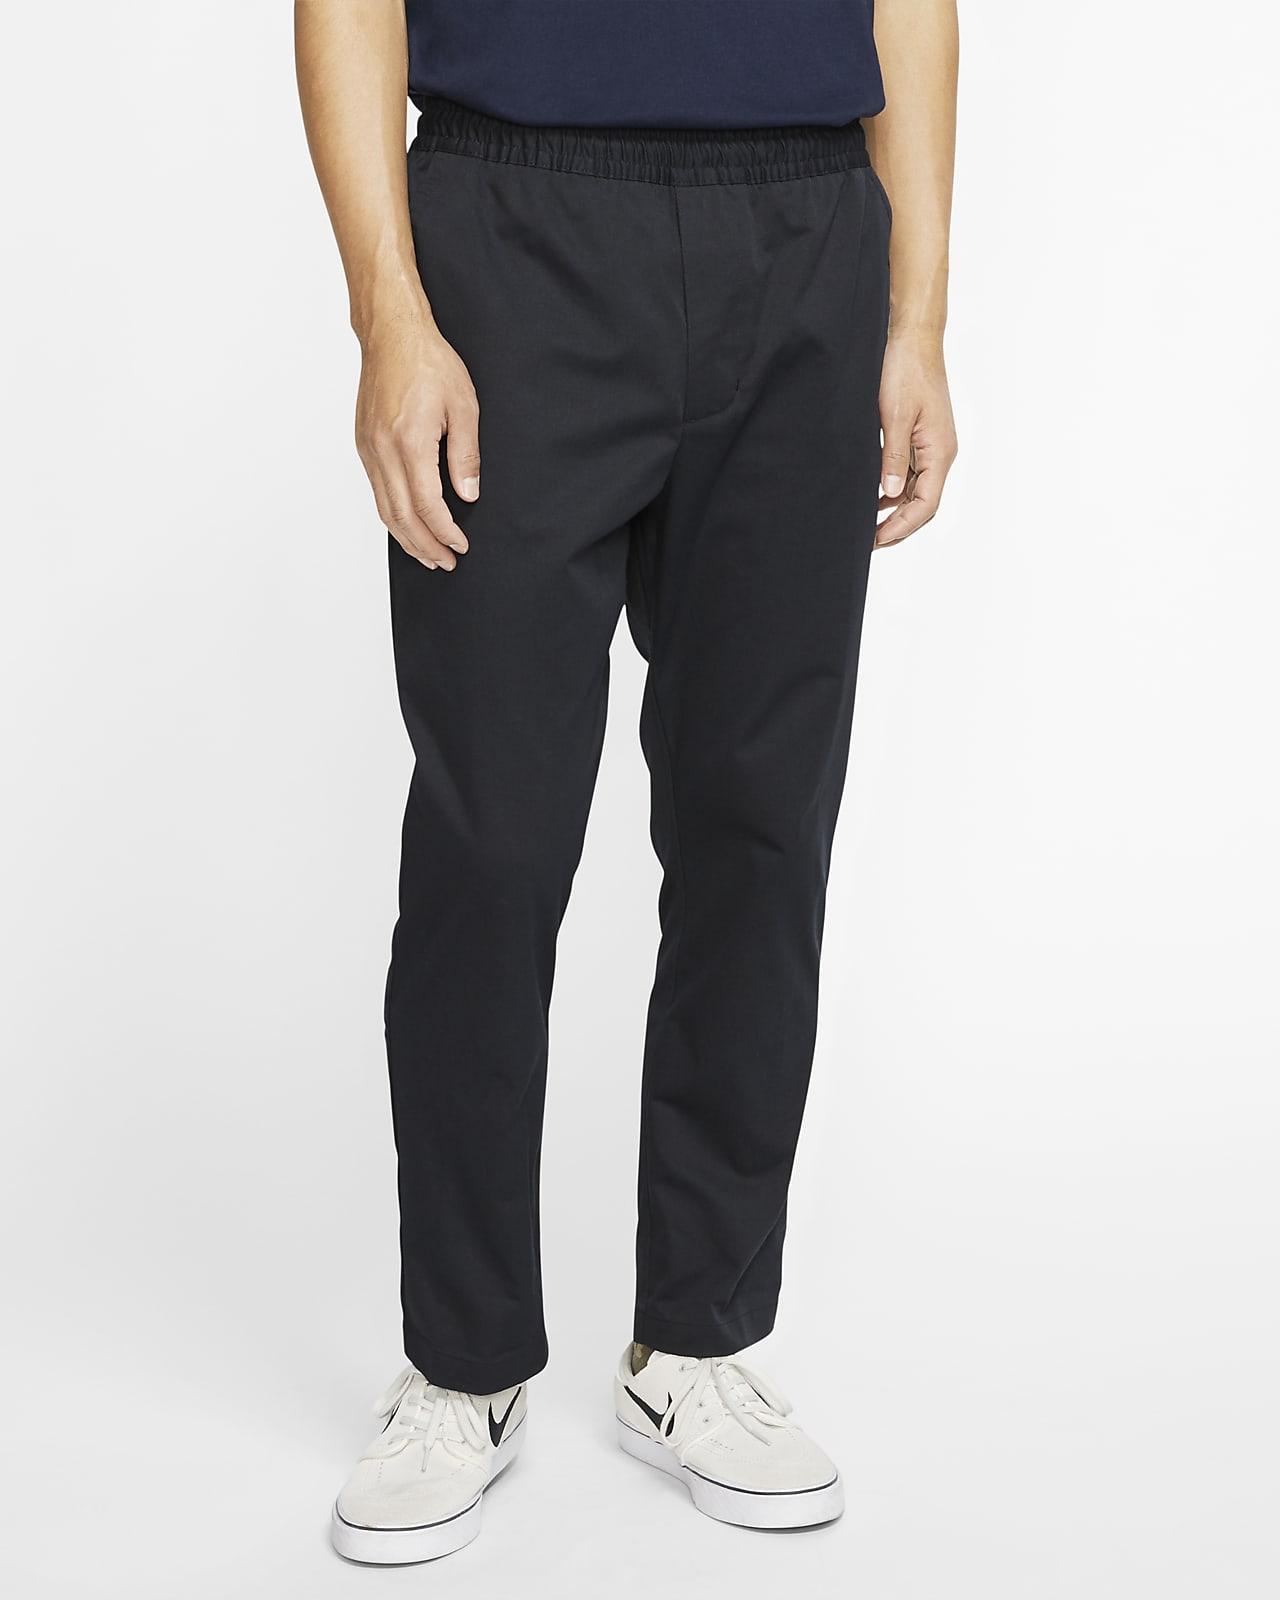 Nike SB Dri-FIT Pantalons Chino de skateboard - Home